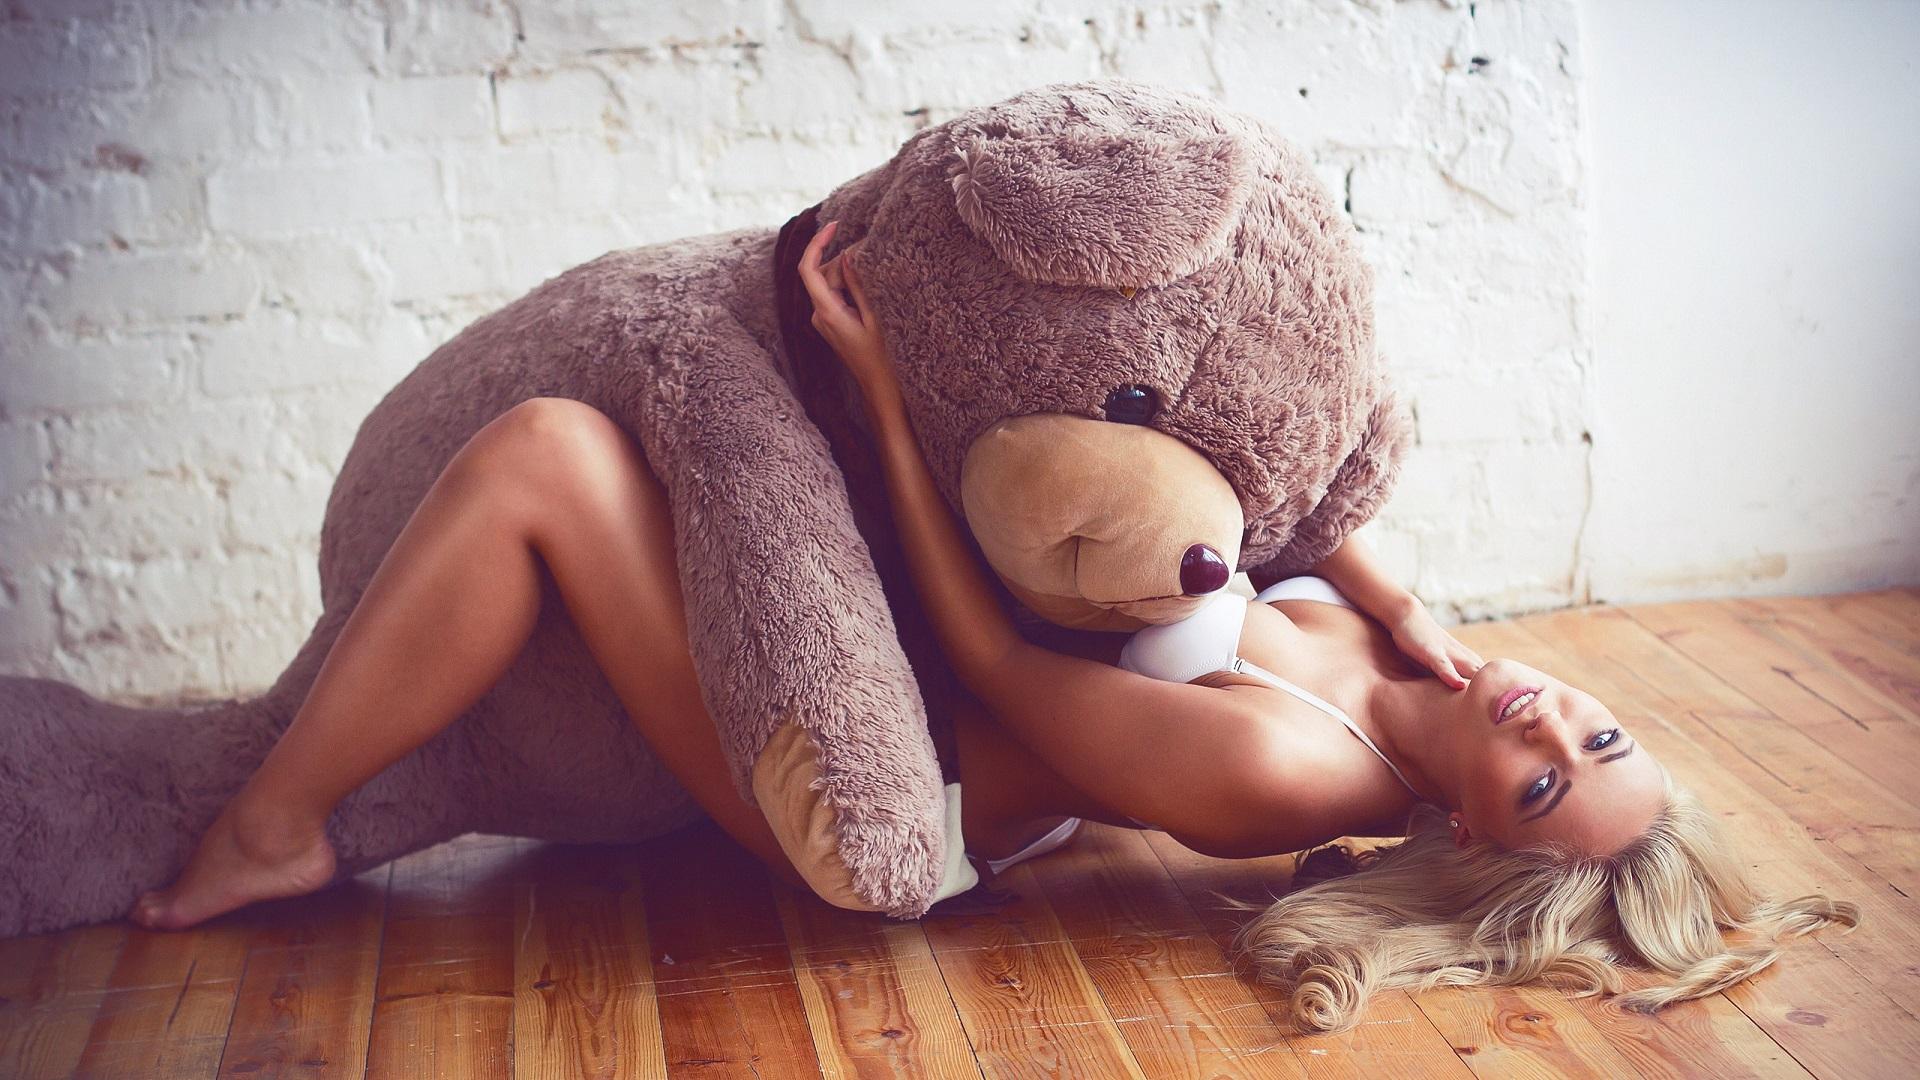 купить секс игрушки москва секс шоп не дорого анонимно